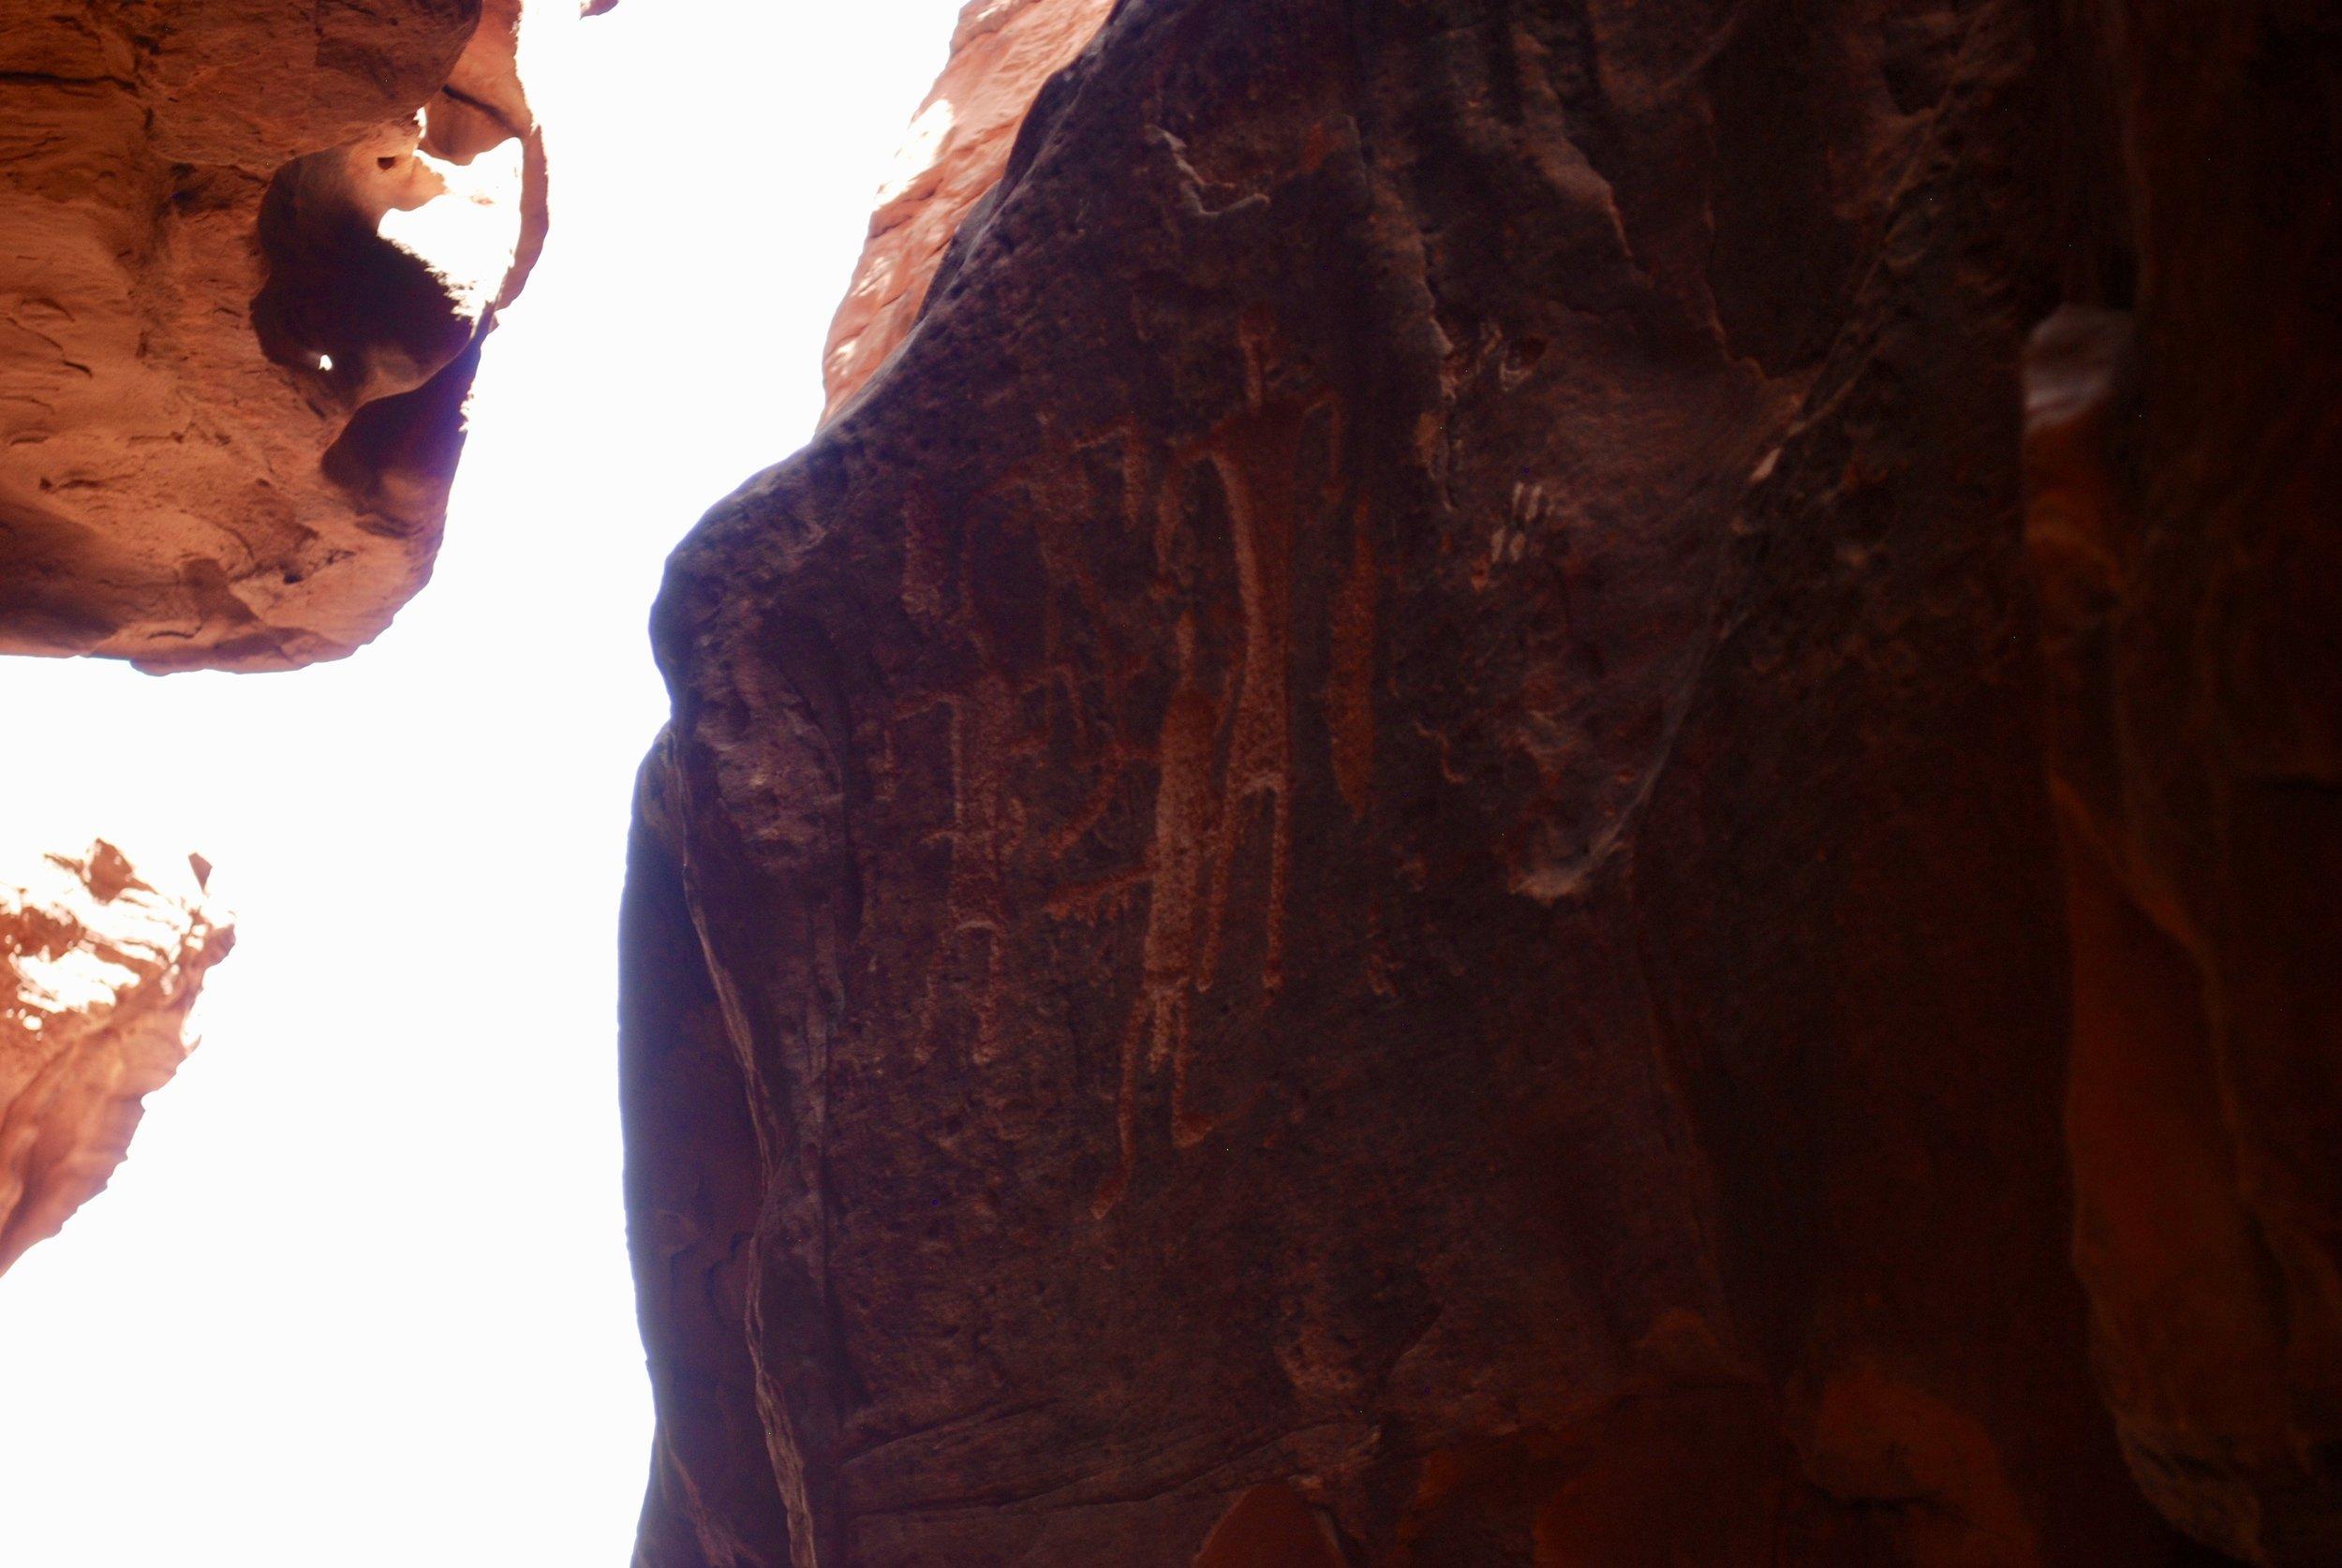 Nabatean Inscriptions Khazali Canyon, Wadi Rum